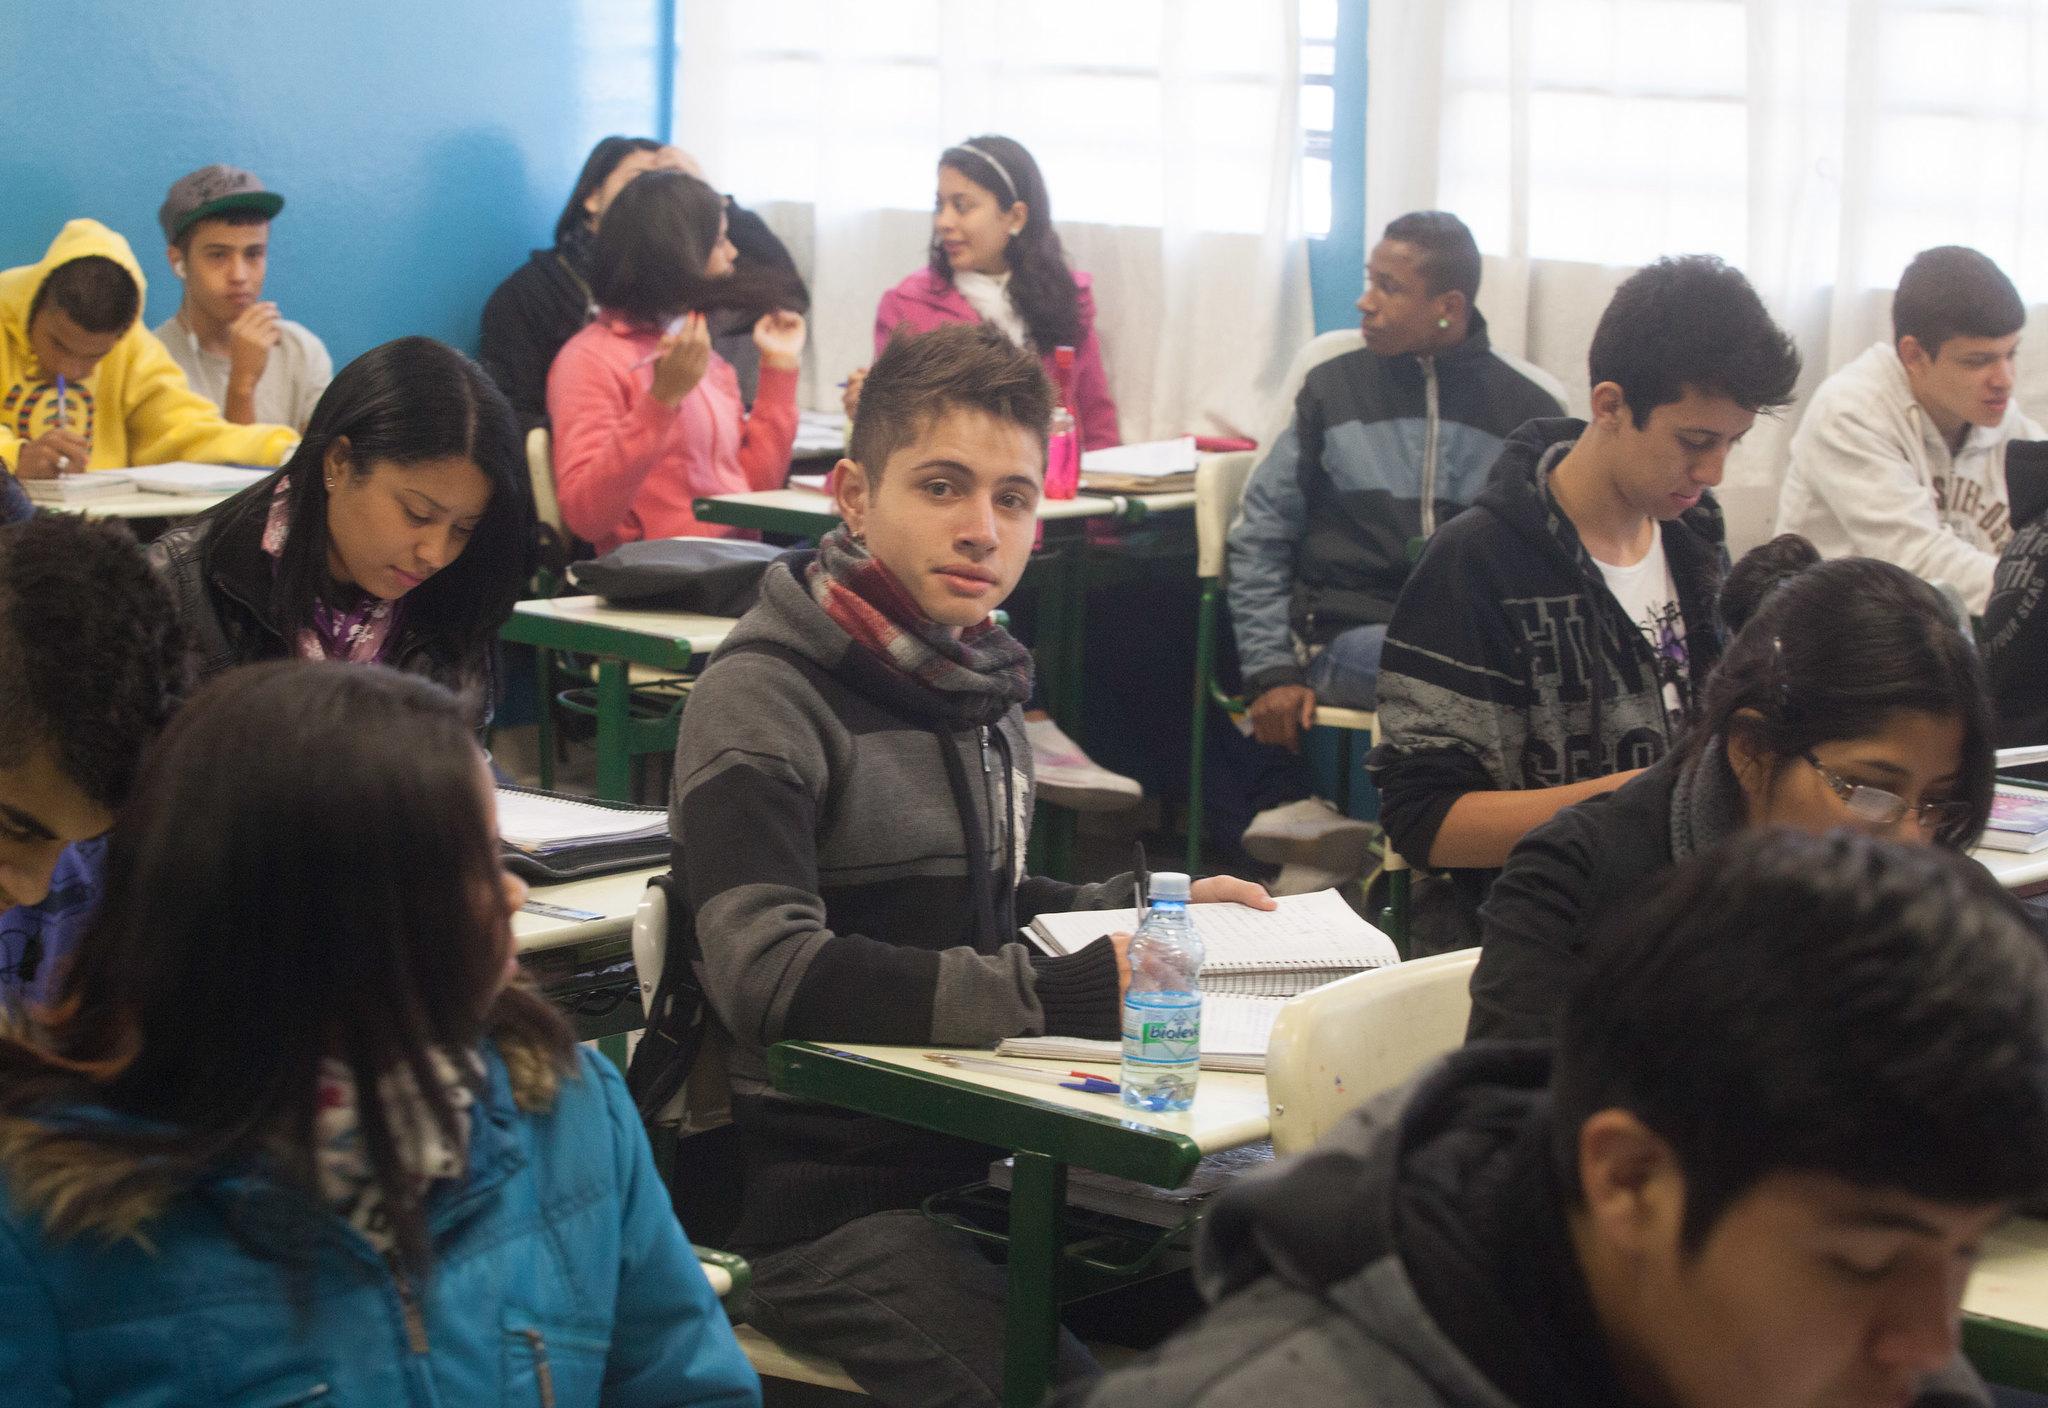 Alief Bianco Romero da Costa, aluno da E E Maria Augusto de Avila, que vai prestar vestibular para area de Medicina. São Paulo/SP 29.08